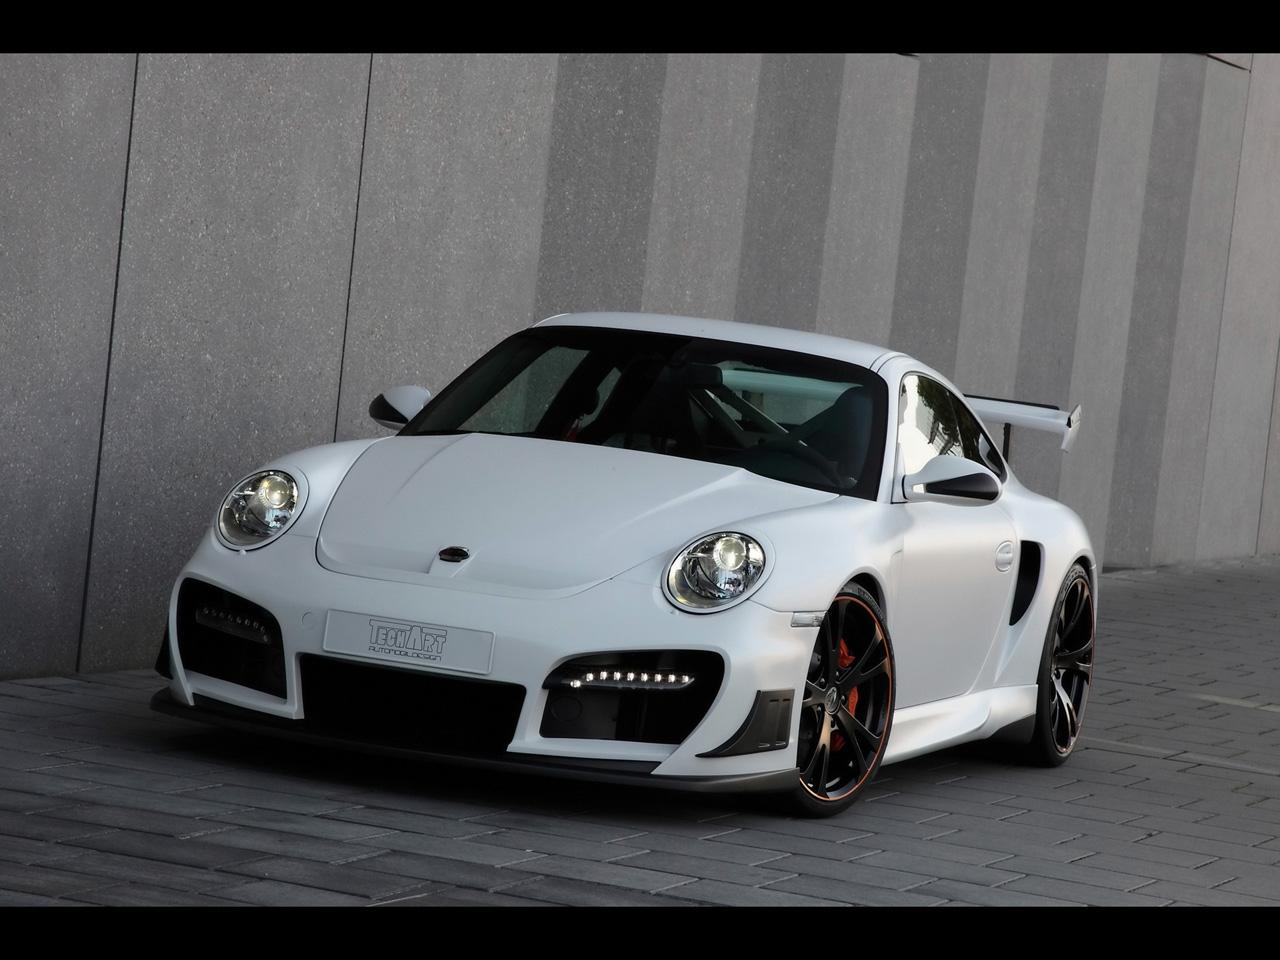 2010 TechArt GT Street RS based on Porsche 911 GT2